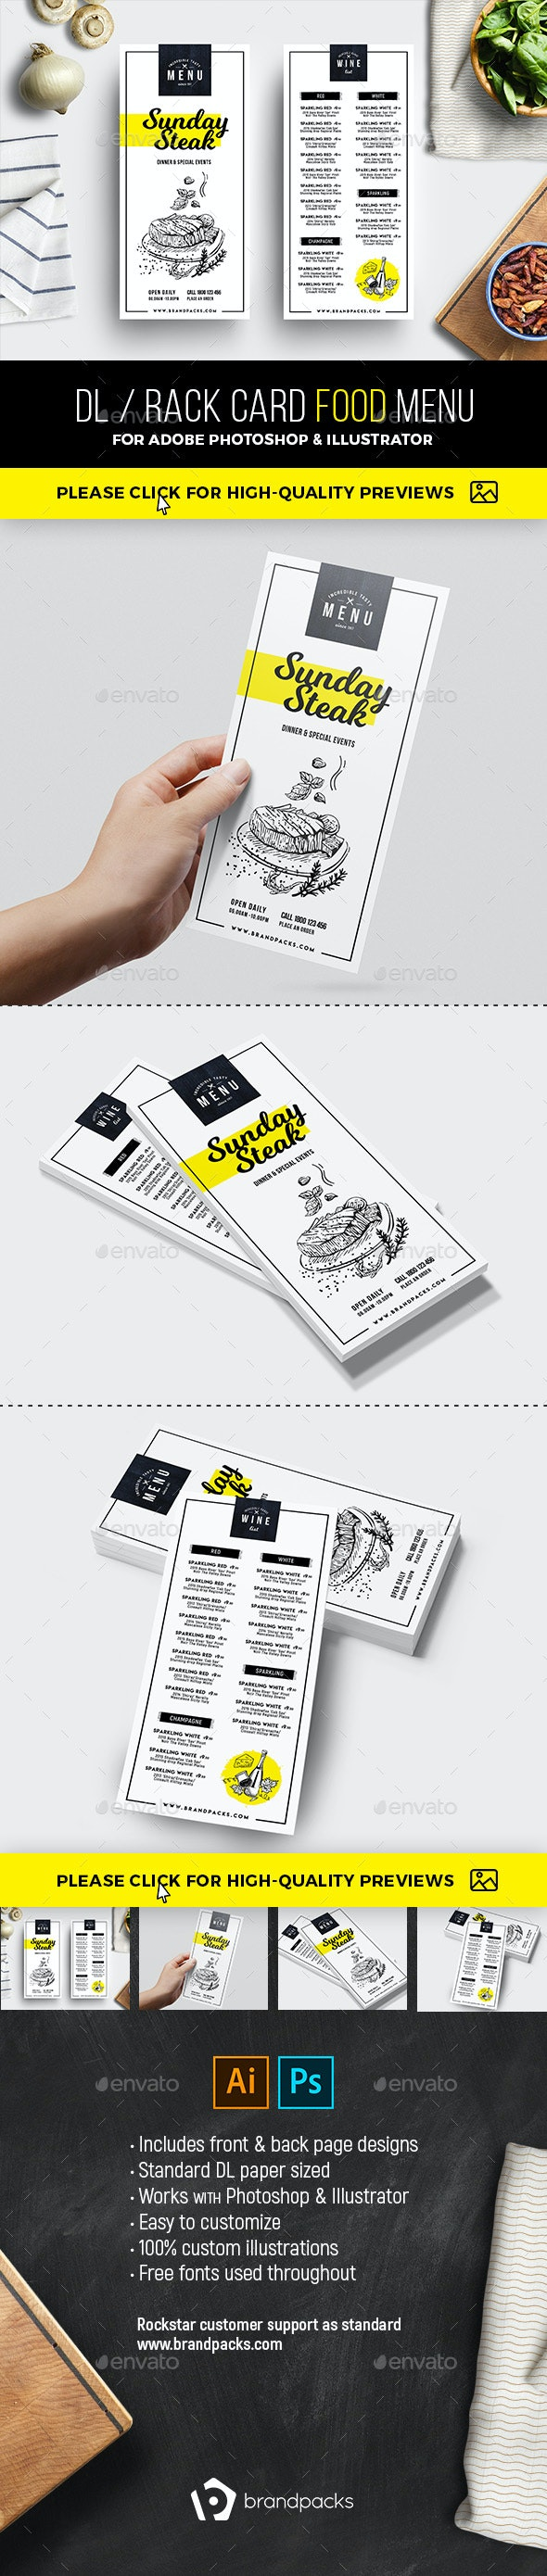 DL Rack Card Food Menu - Food Menus Print Templates